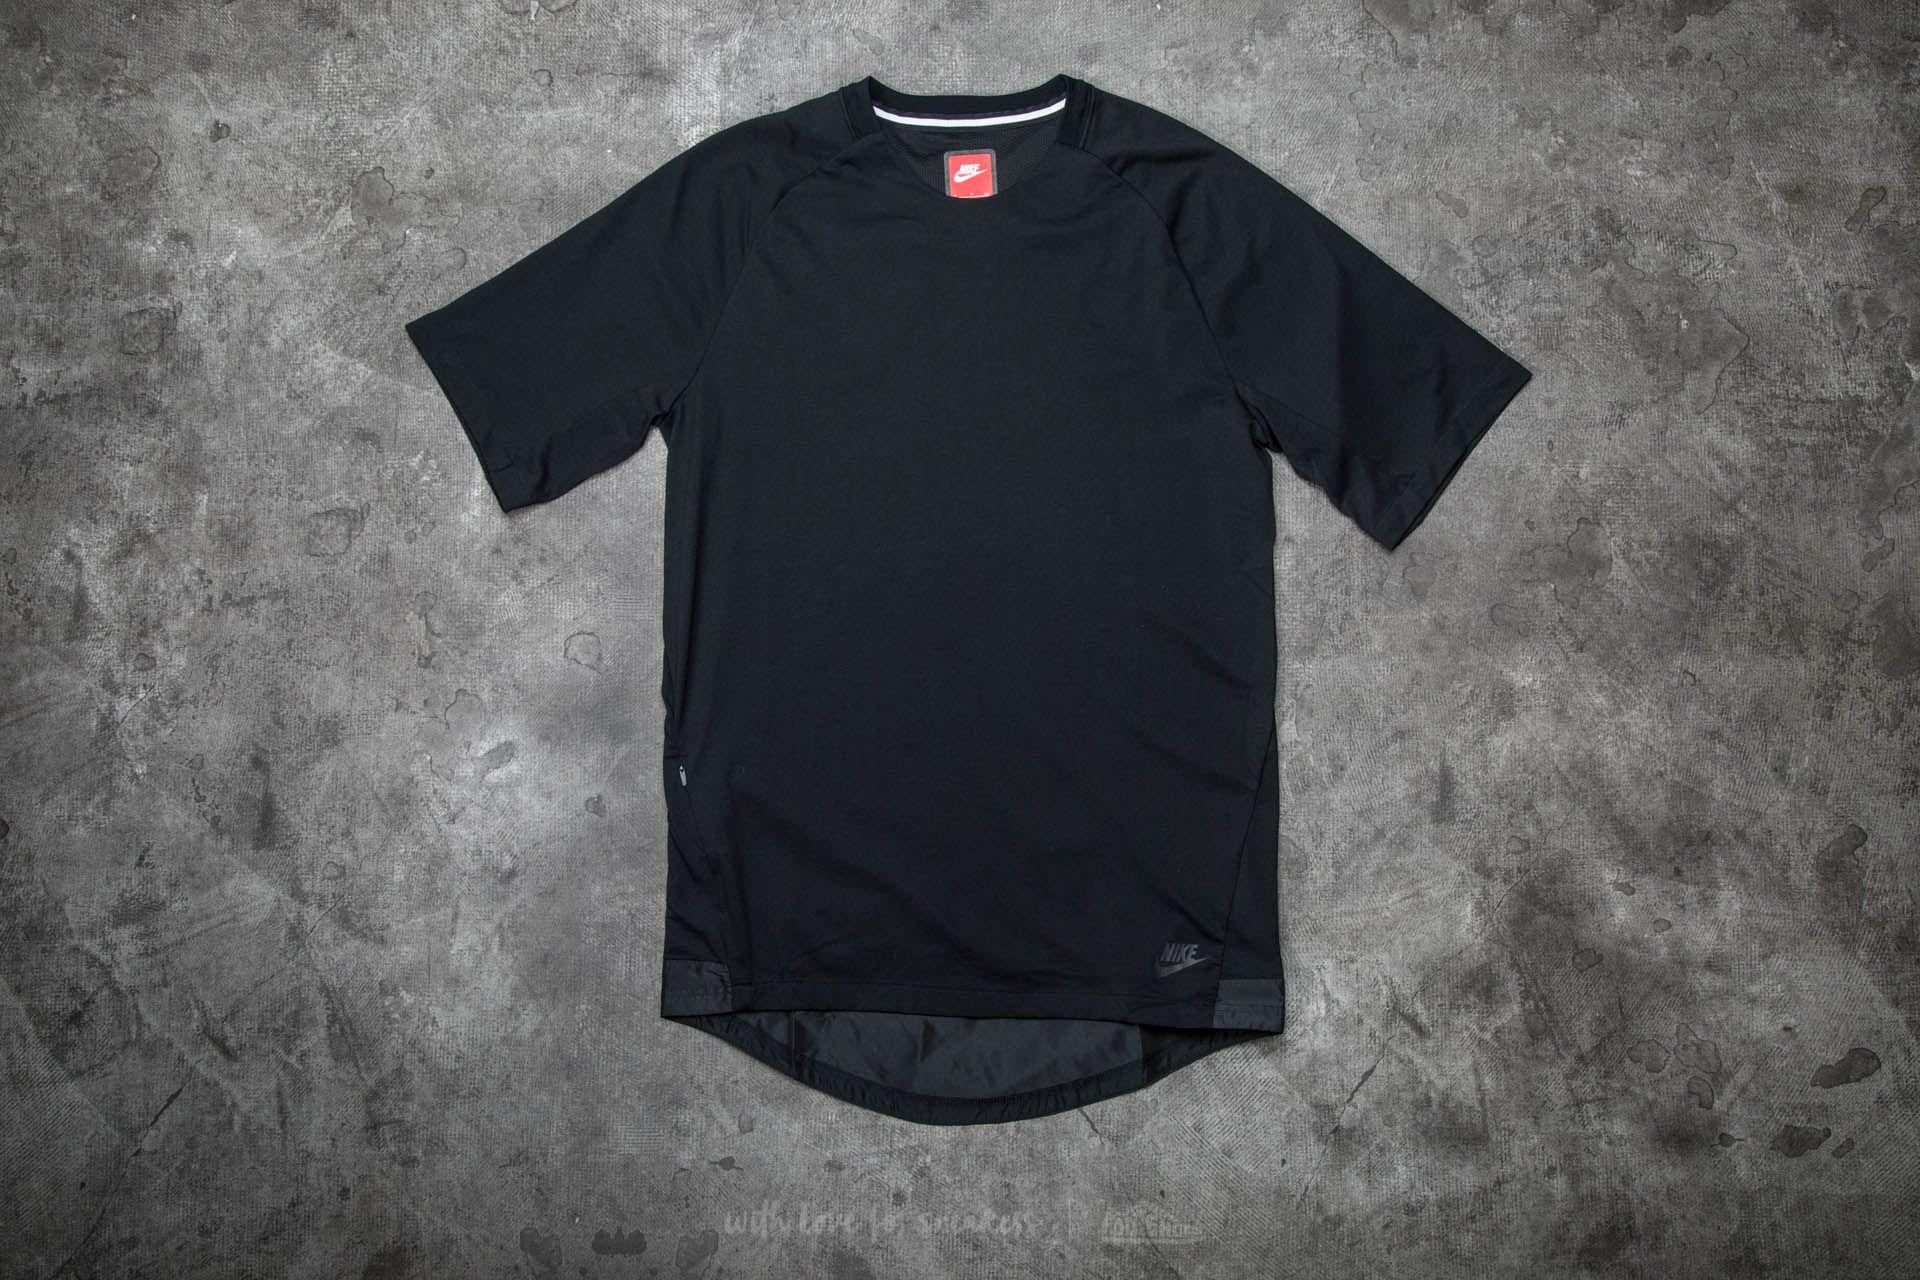 Nike Sportwear Bonded Short Sleeve Top